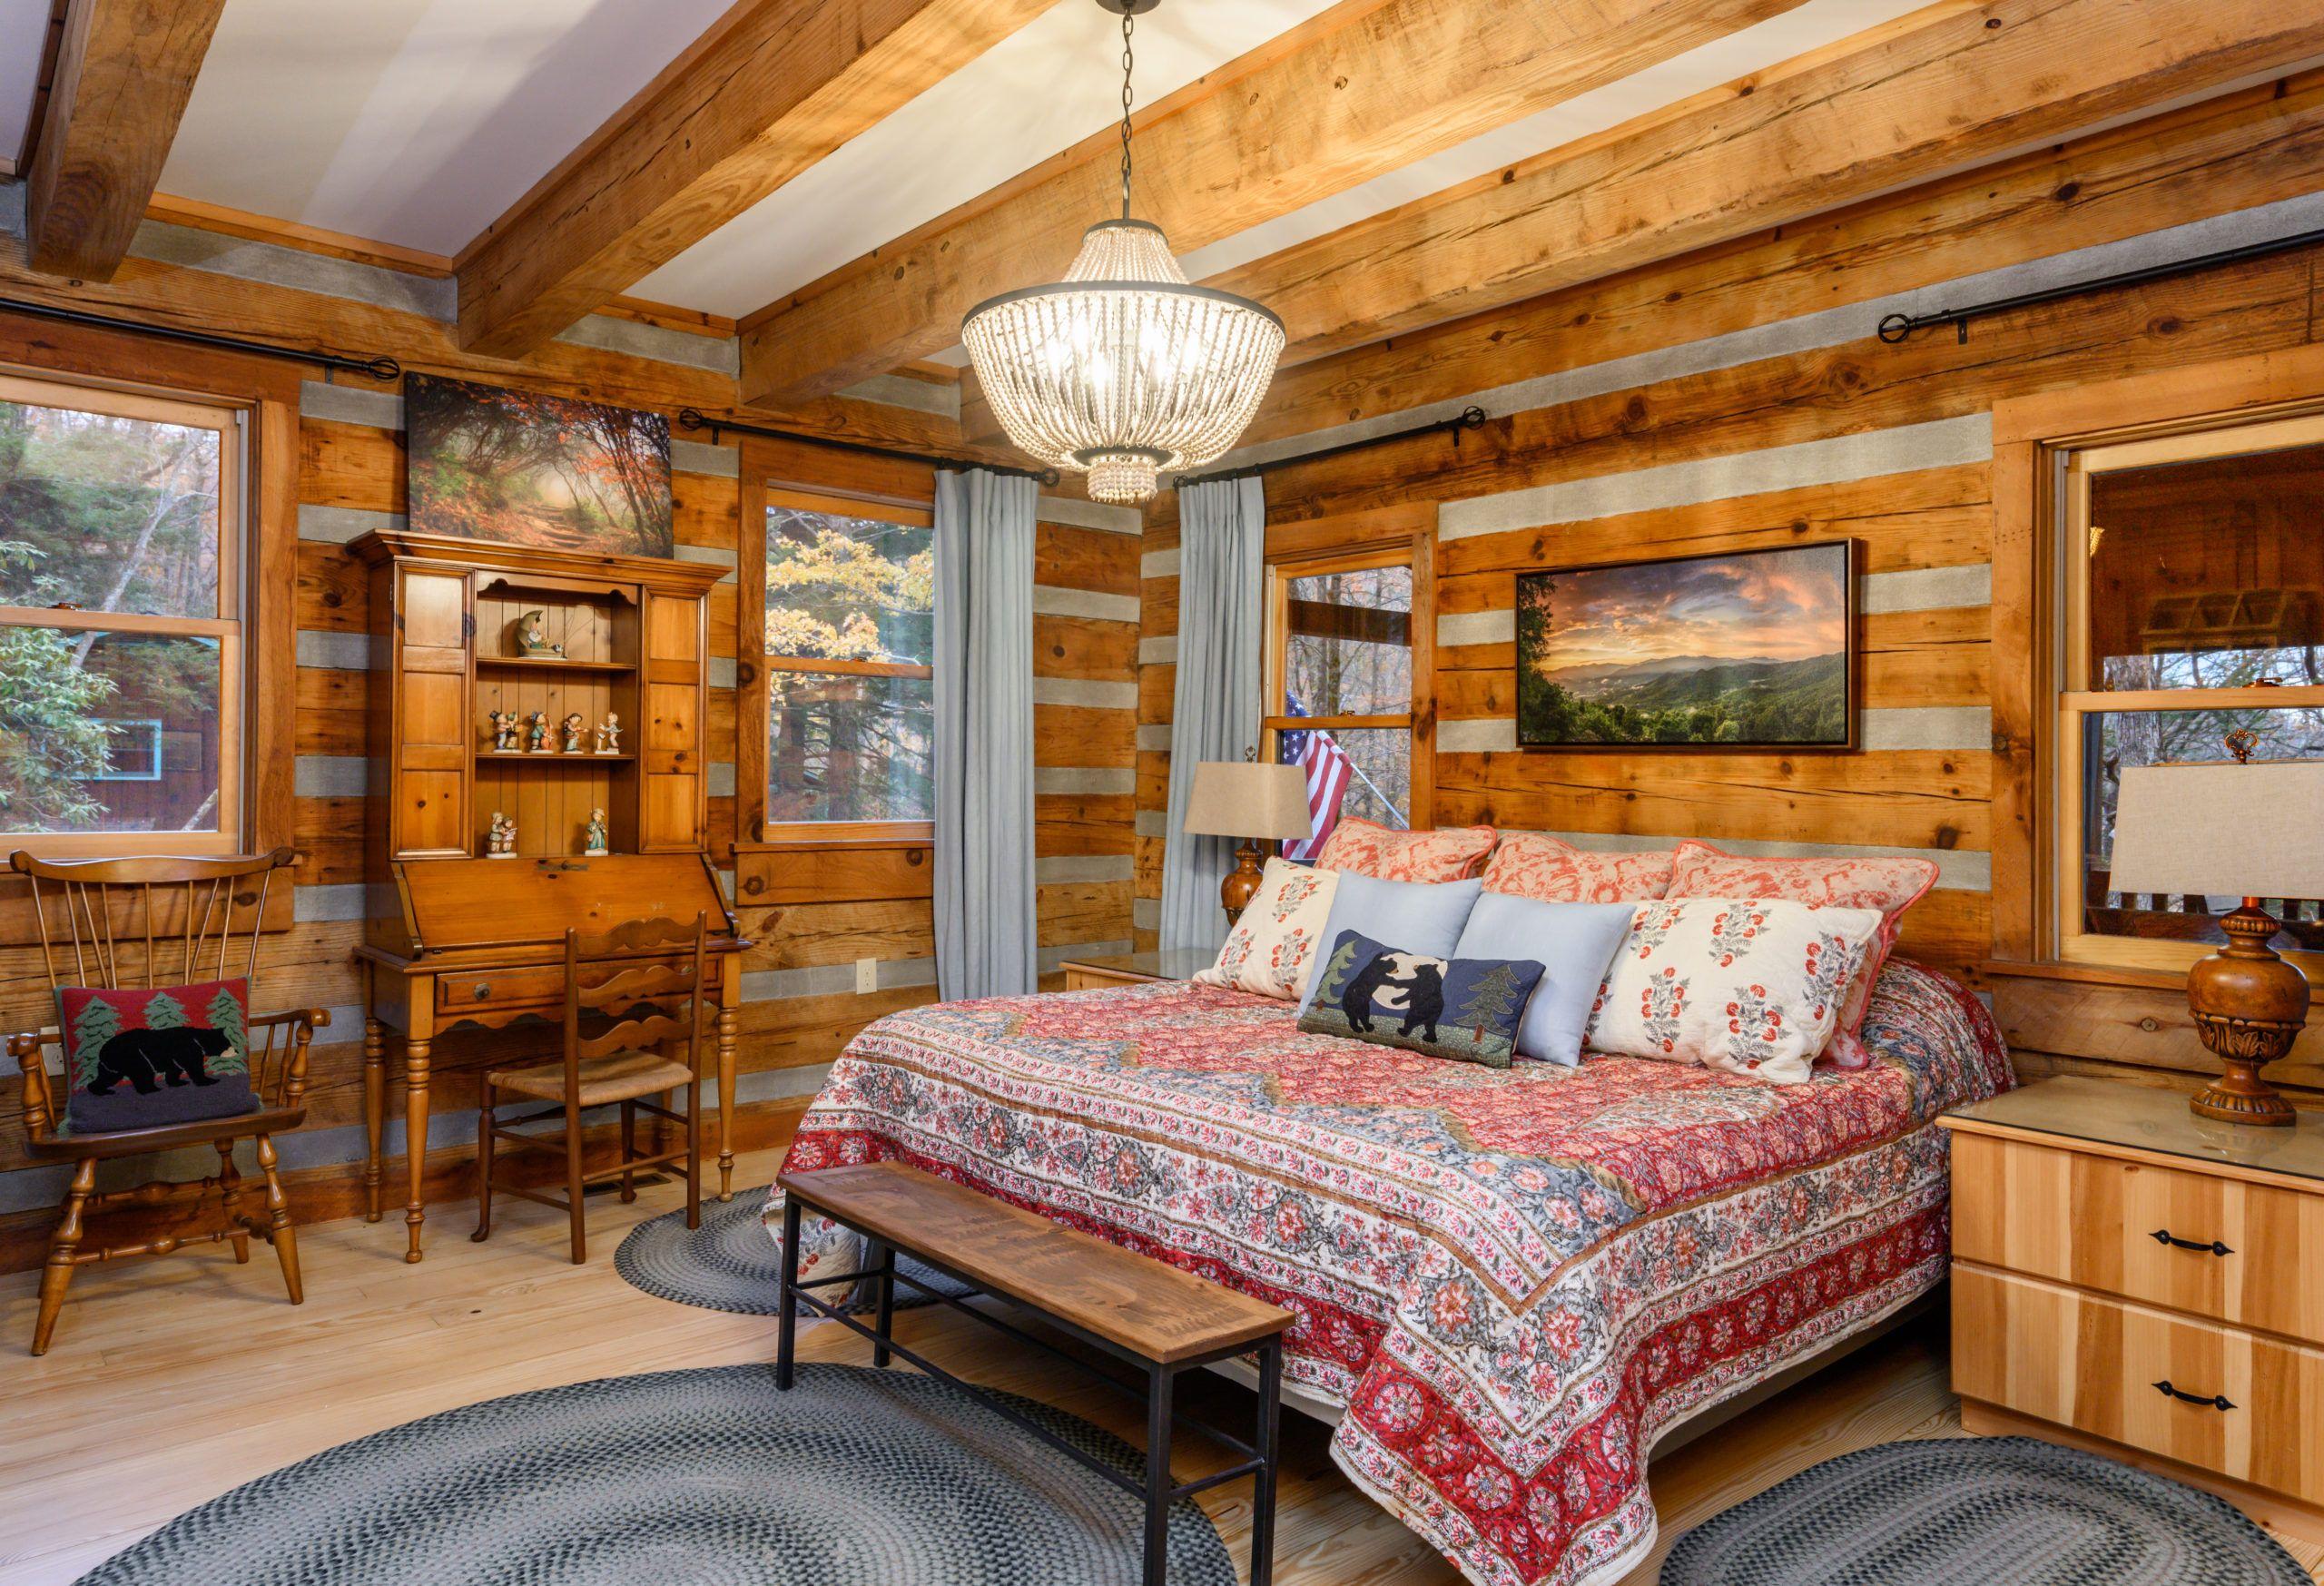 Cozy Cabin Update in 2020 Cozy cabin, Home decor